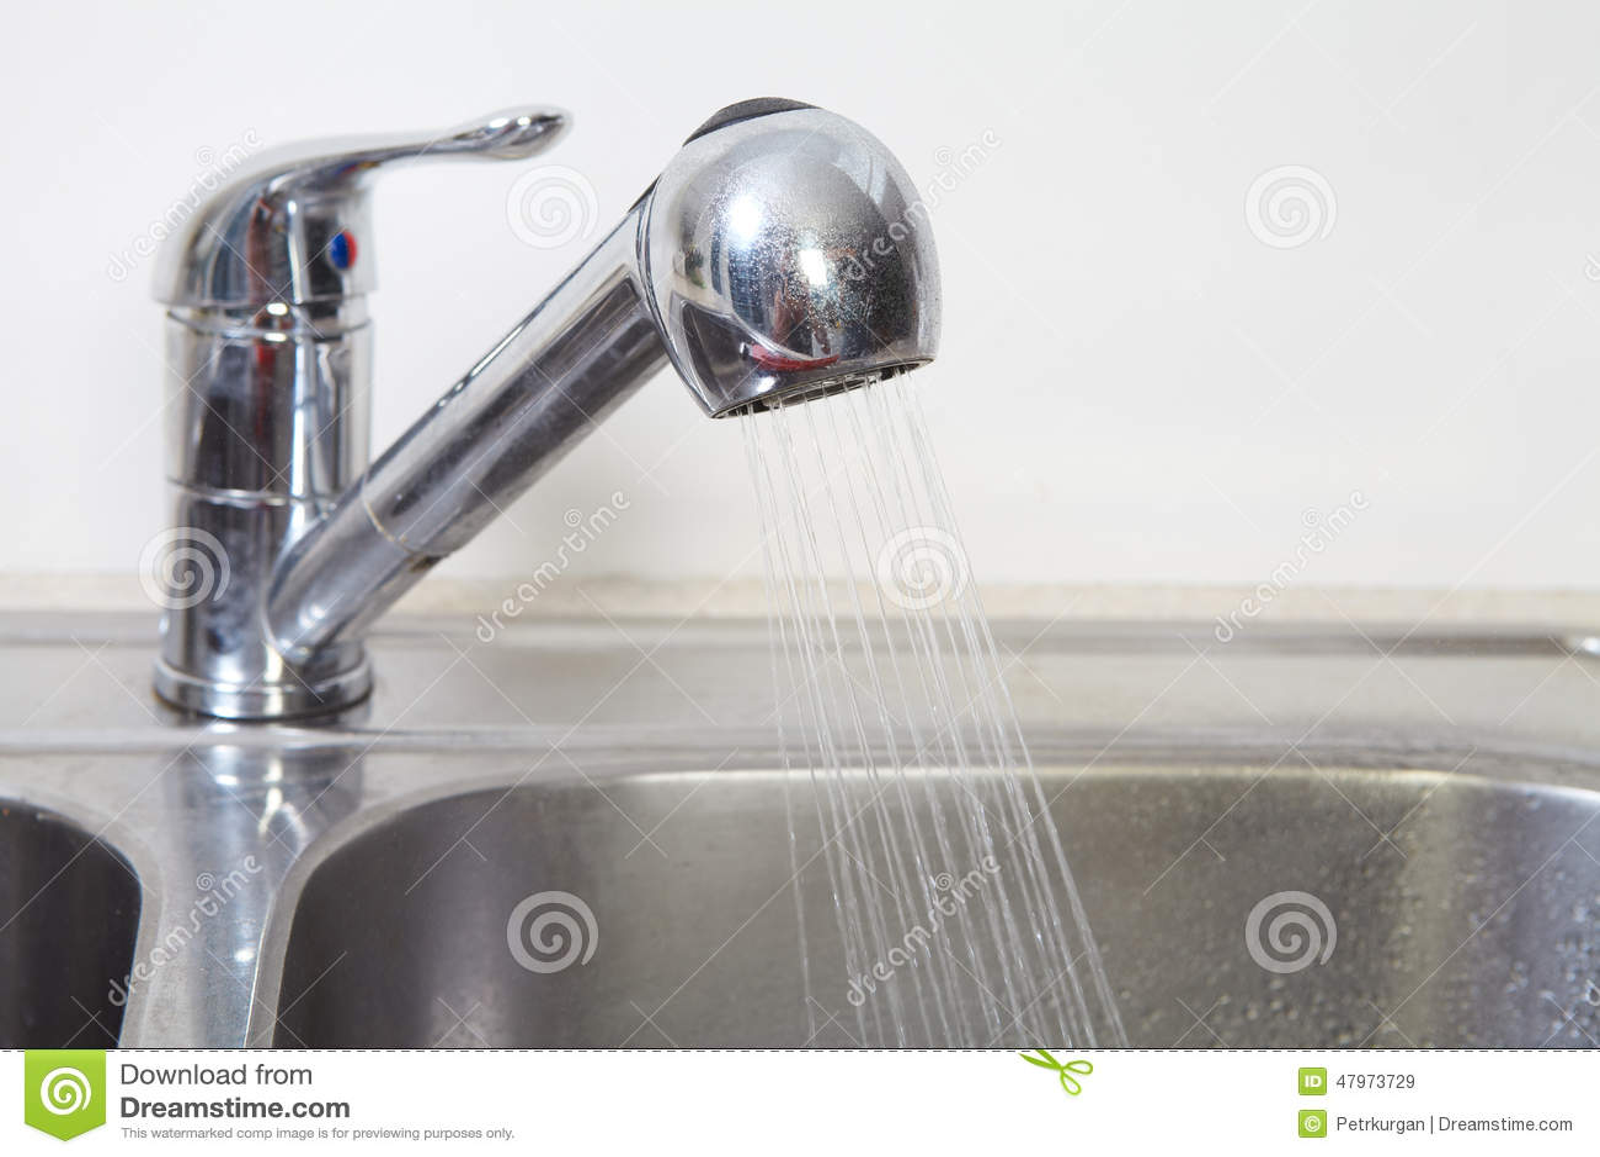 Clogged Kitchen Sink Stock Photo Cartoondealer Com 79500750